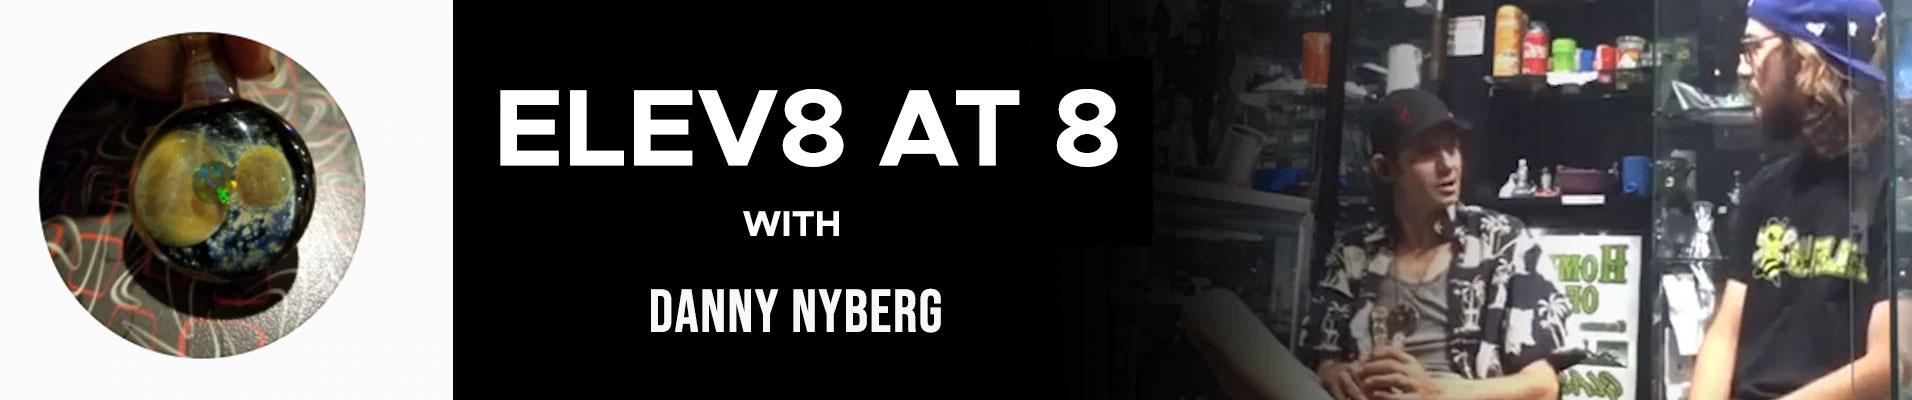 24-danny-nyberg.jpg